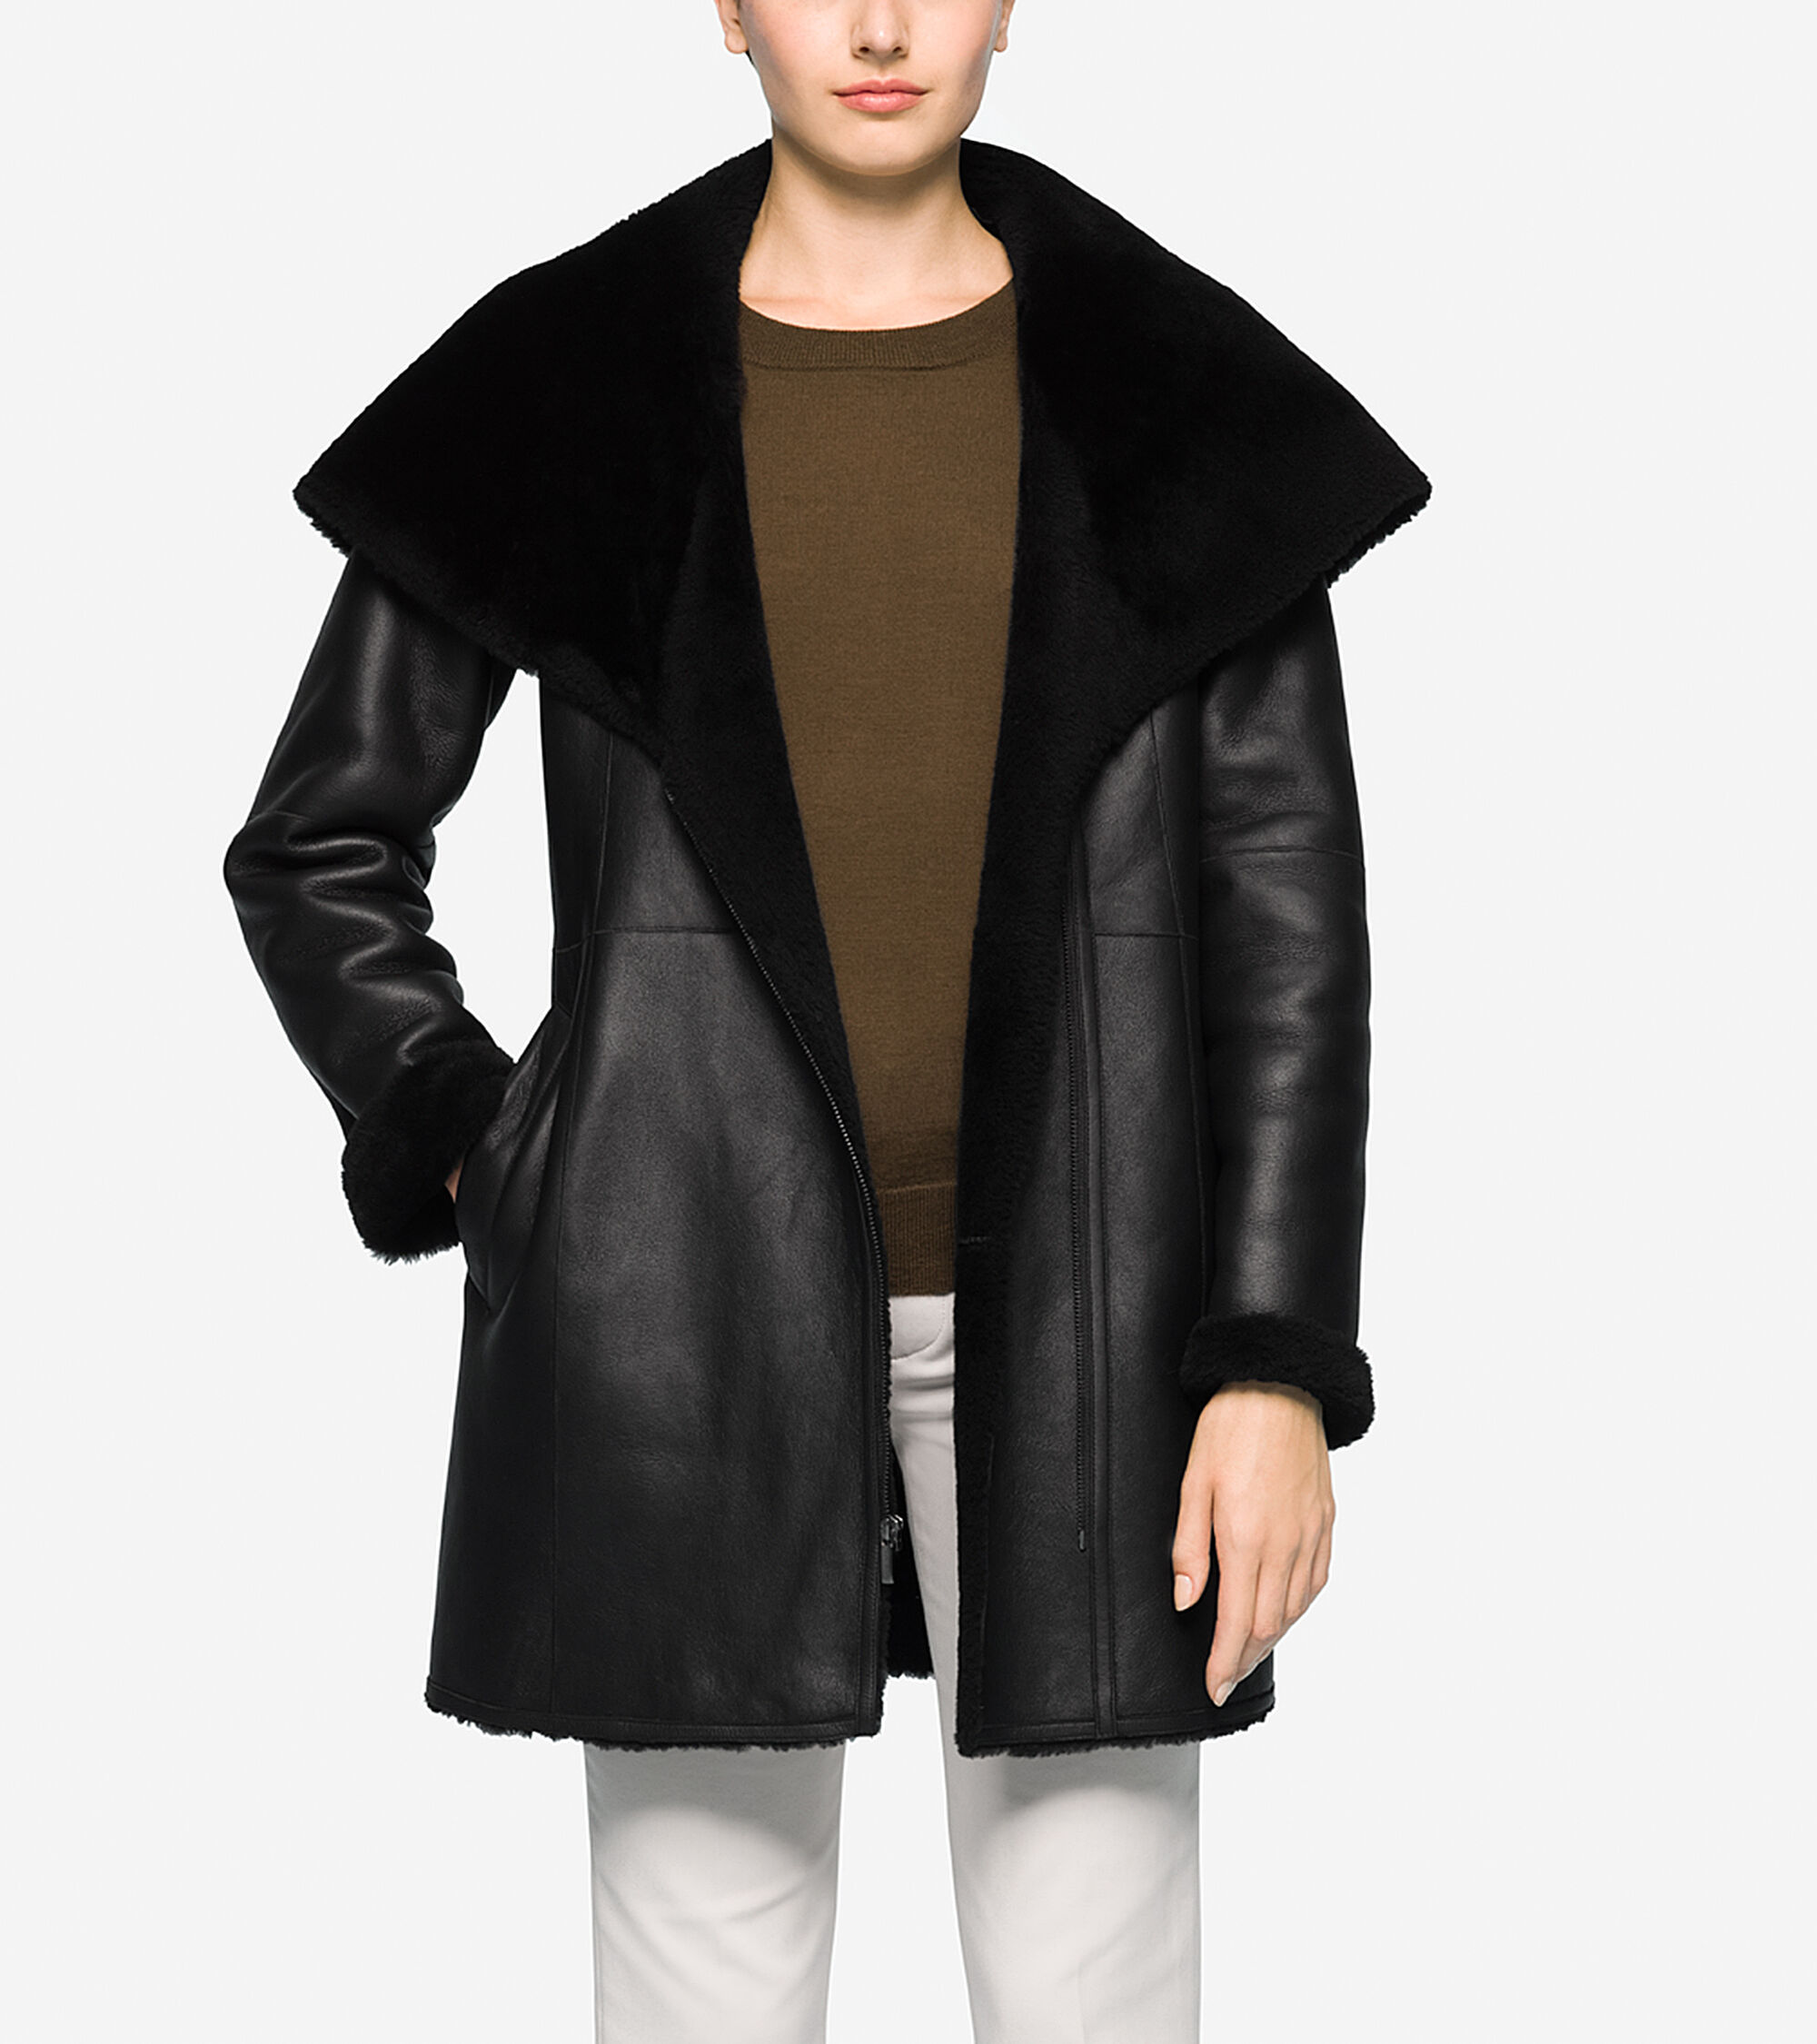 Hooded Shearling Coat in Black  79a11b6fd